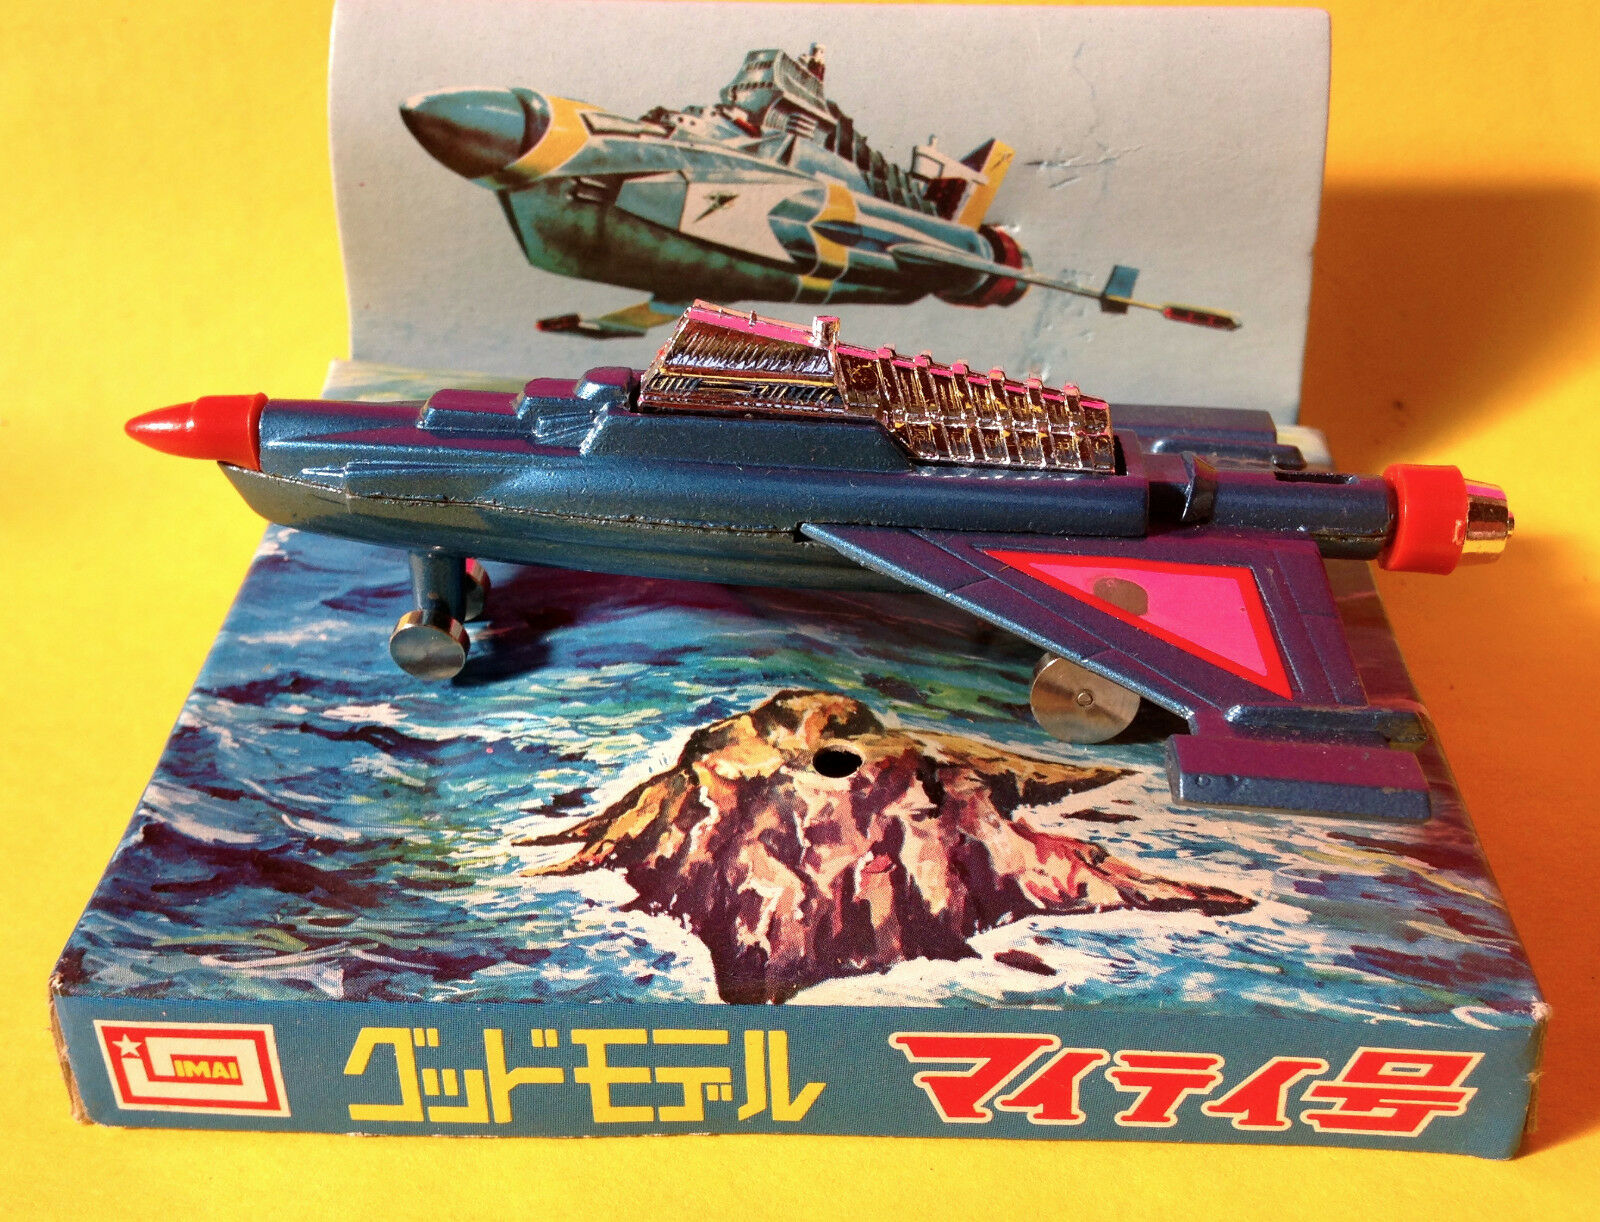 Imai gutes modell mächtig los fahrzeug griff charakter takatoku mini - druckguss chogokin